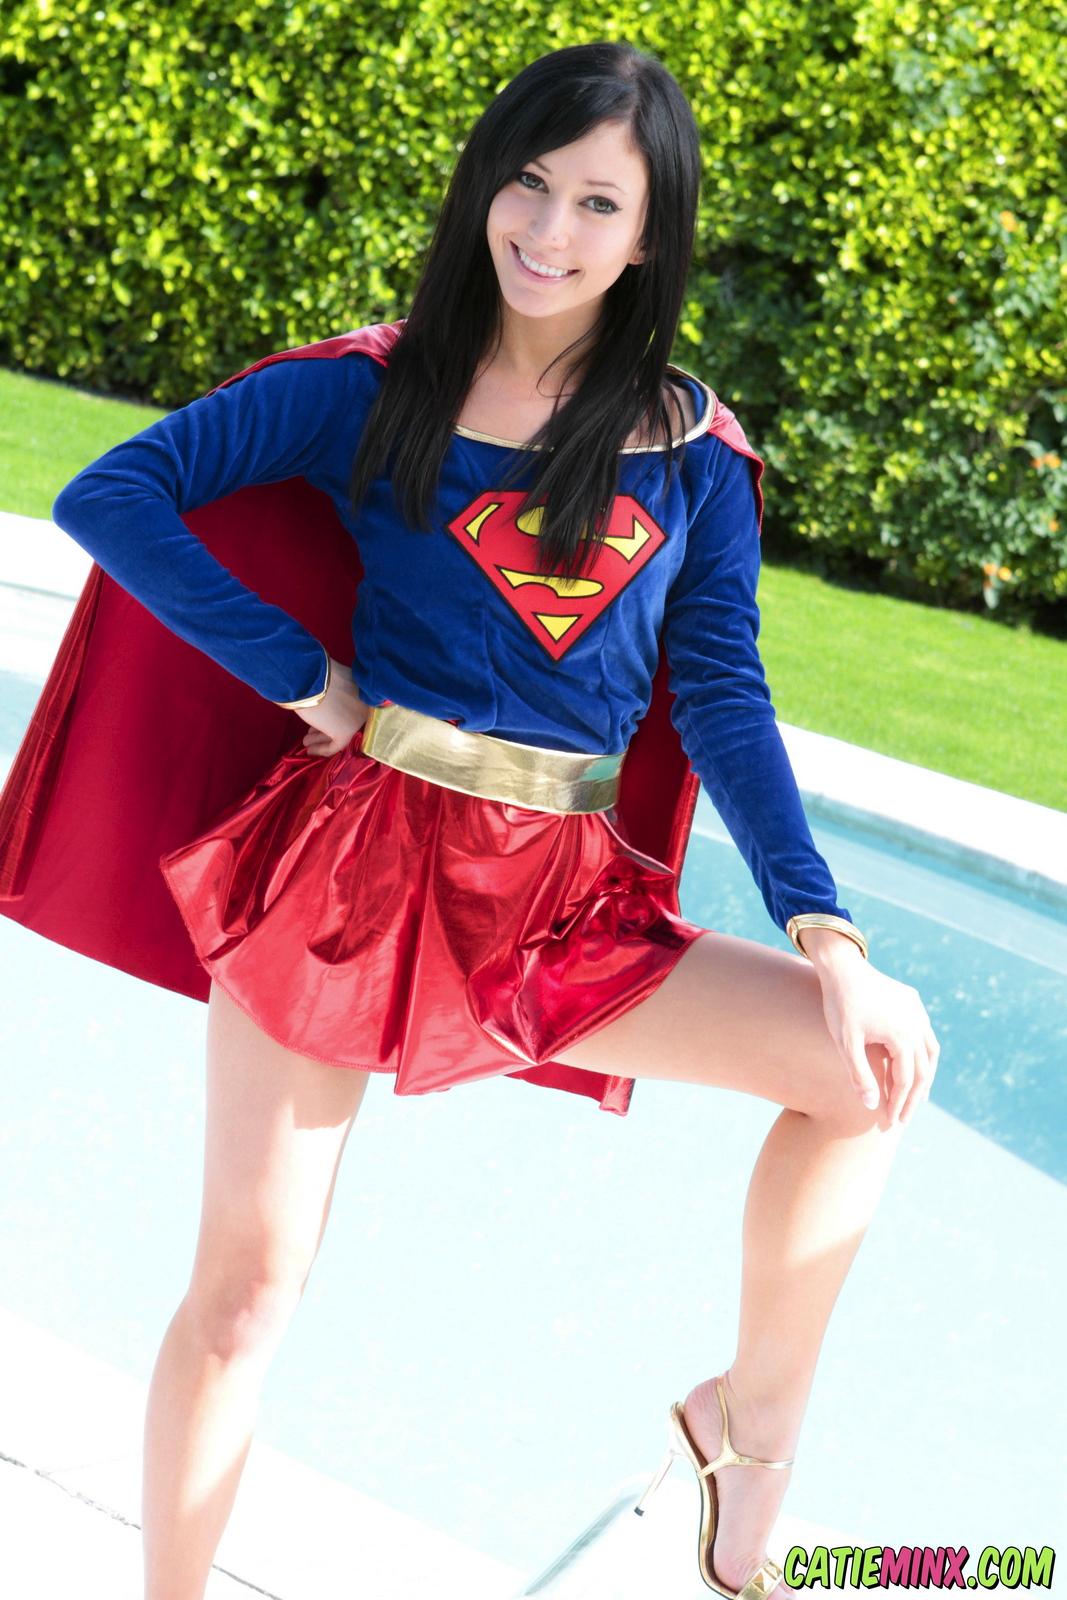 catie-minx-supergirl-costiume-poolside-young-brunette-nude-03